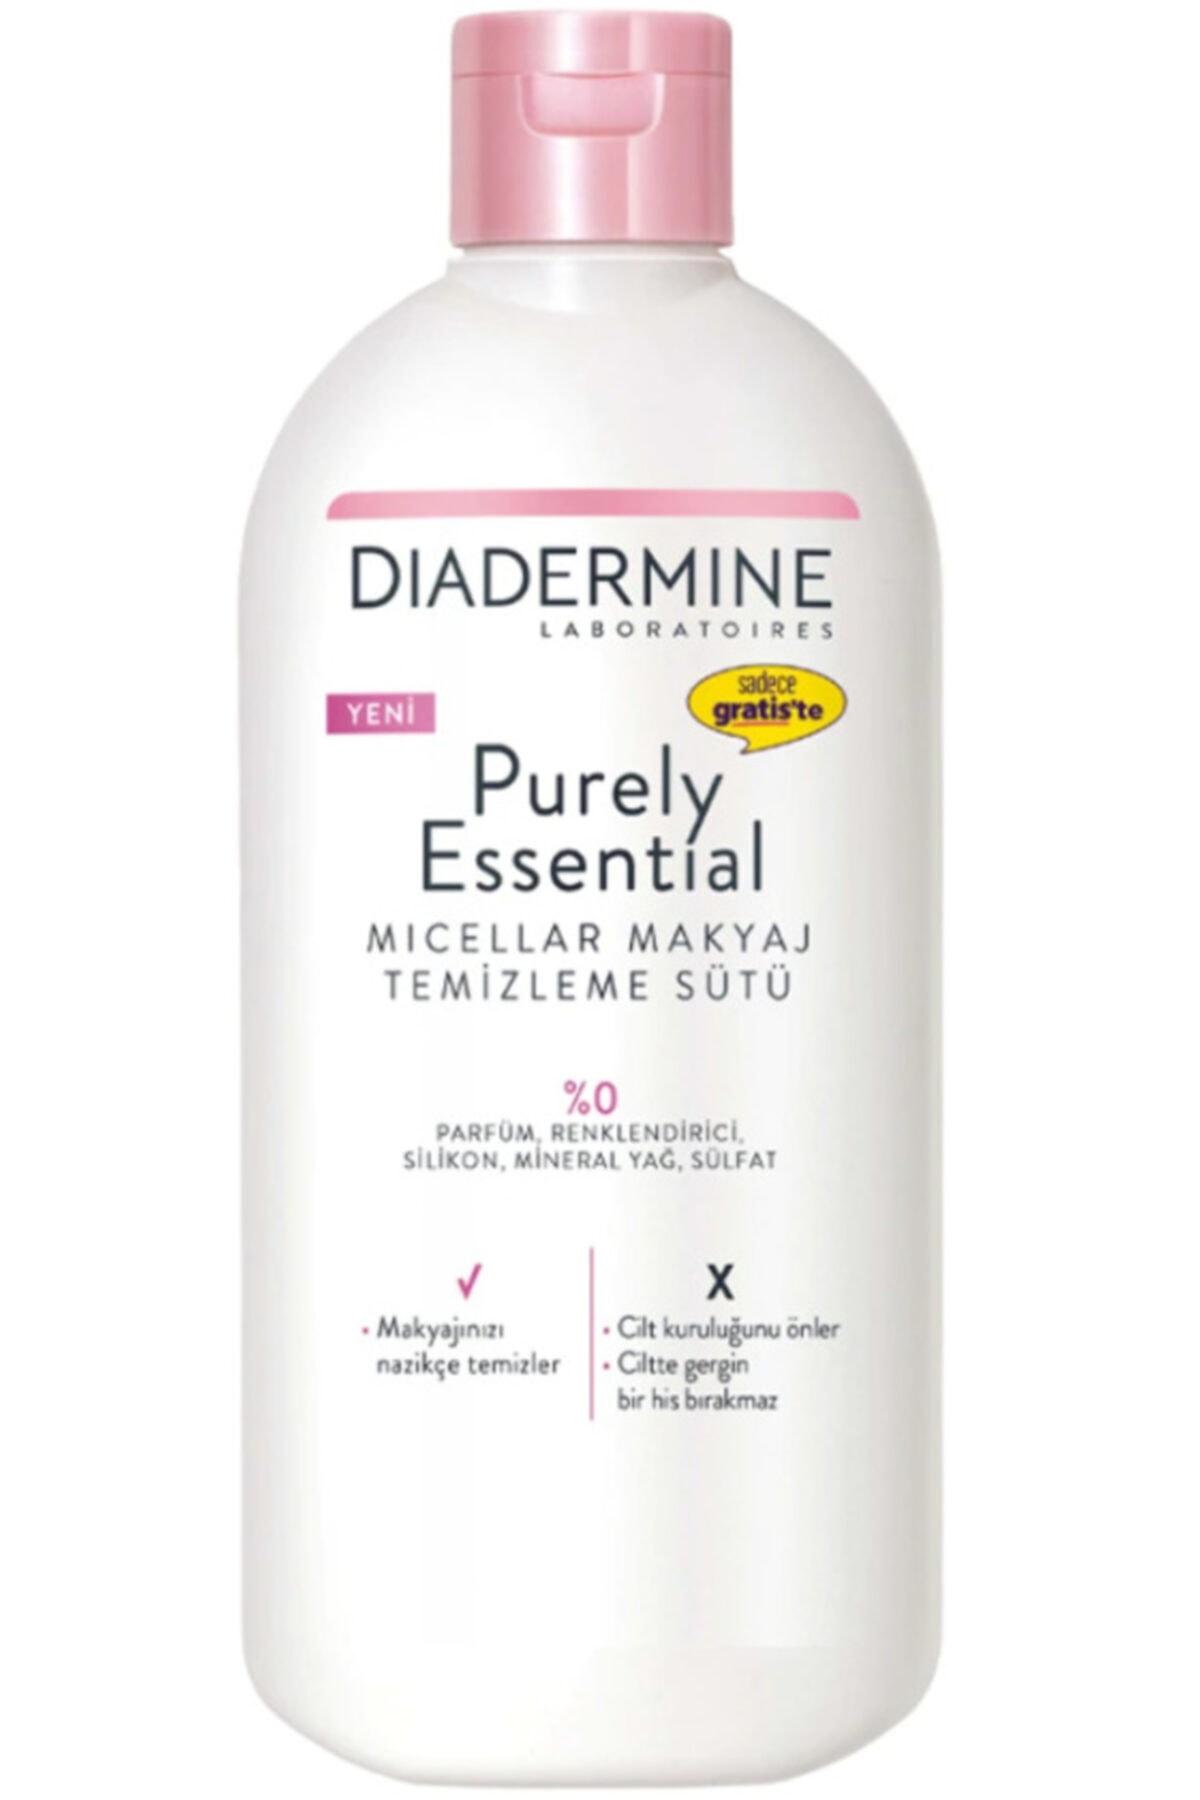 Diadermine Purely Essential Micellar Makyaj Temizleme Sütü 400 Ml 1